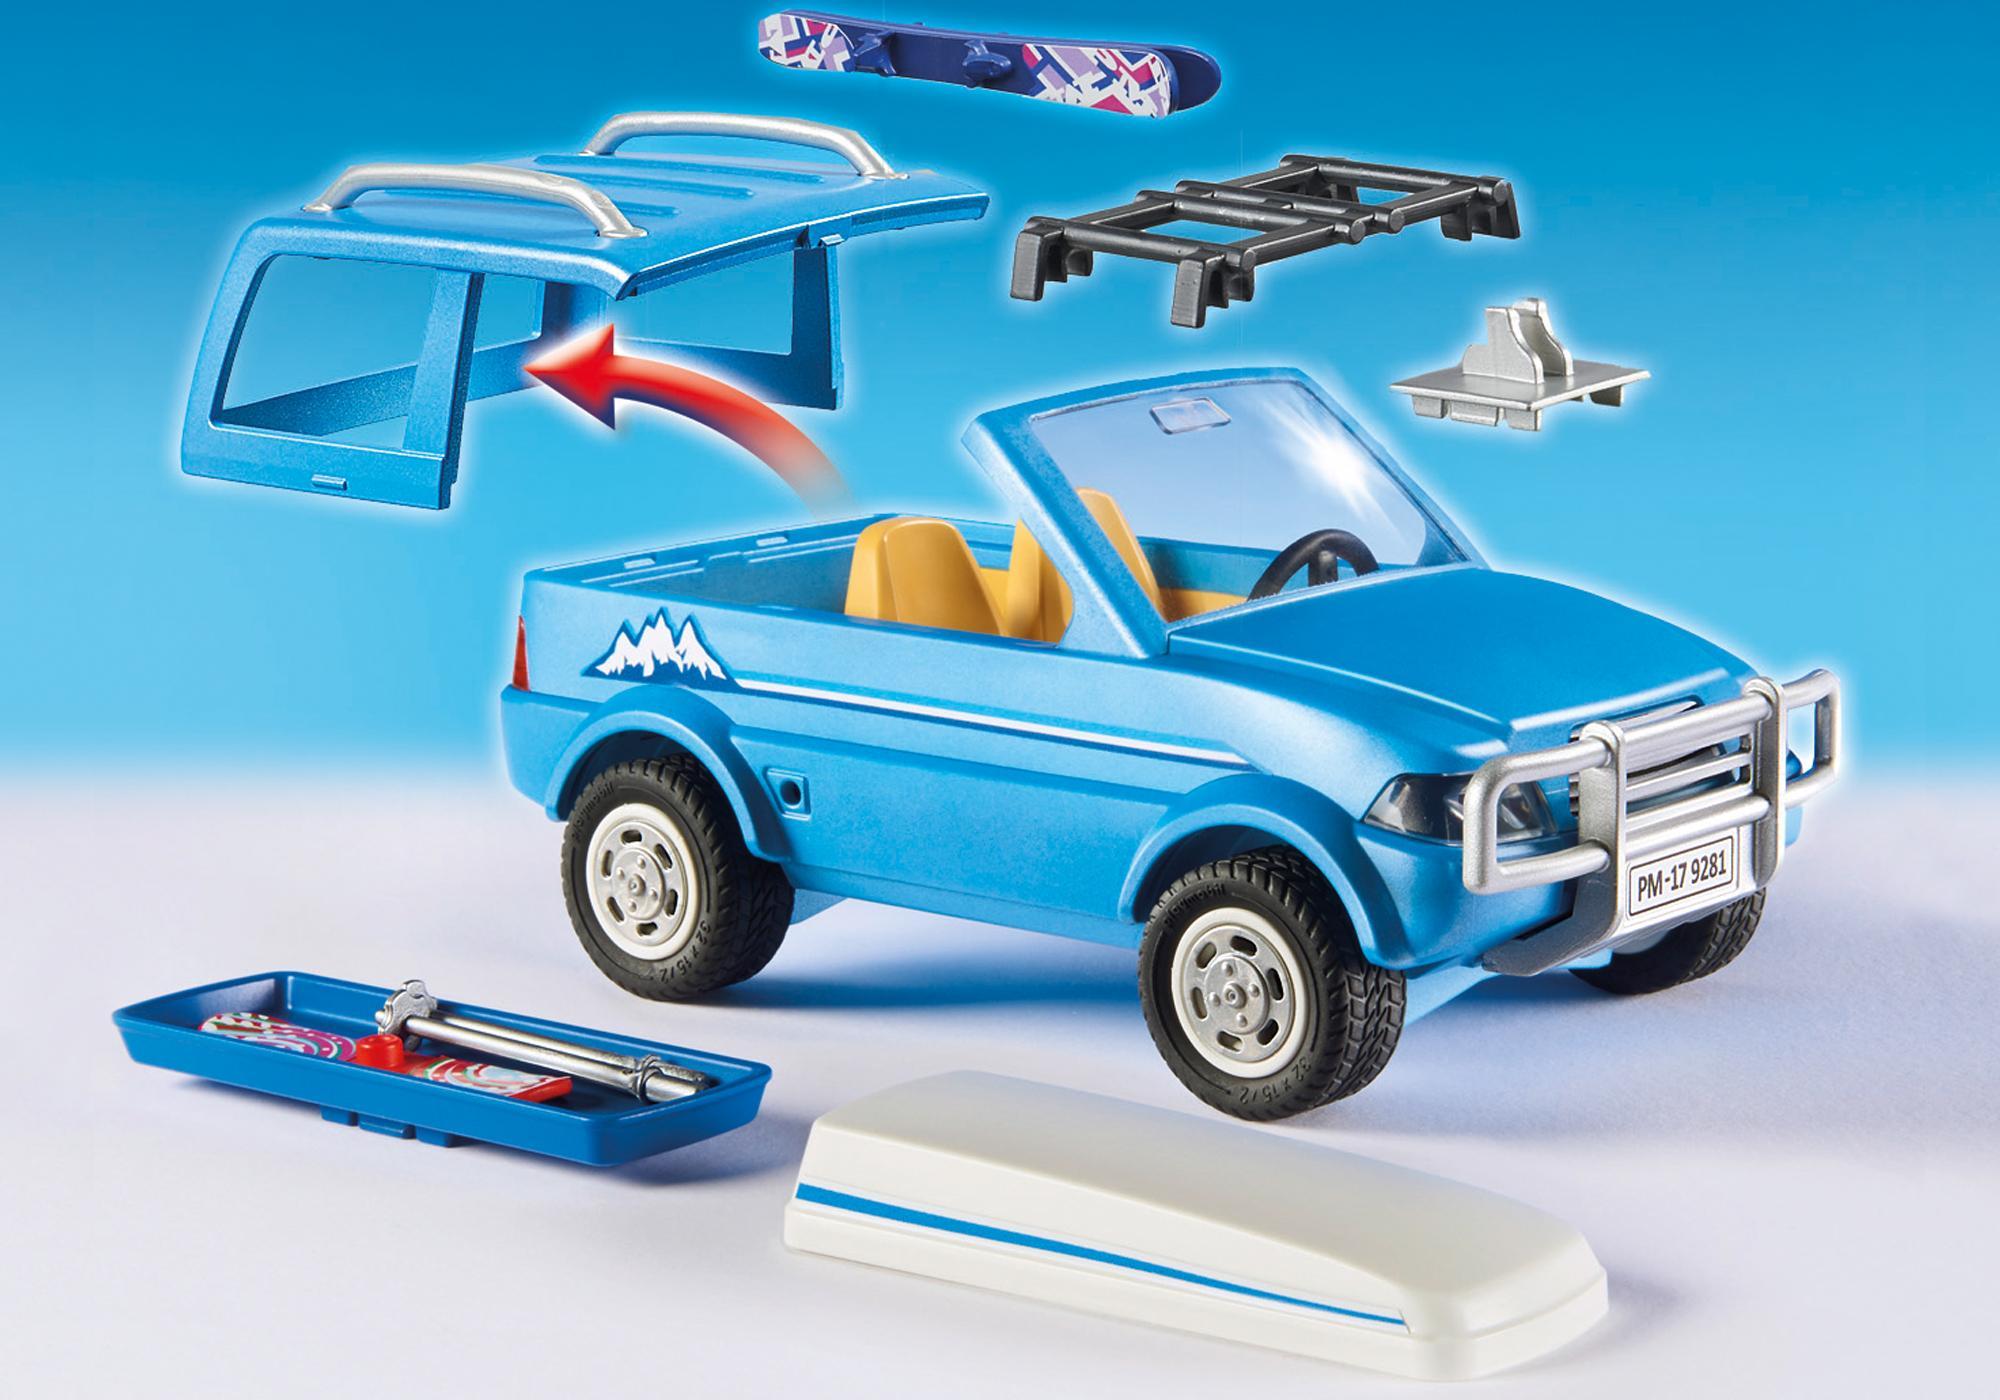 http://media.playmobil.com/i/playmobil/9281_product_extra3/Winter SUV